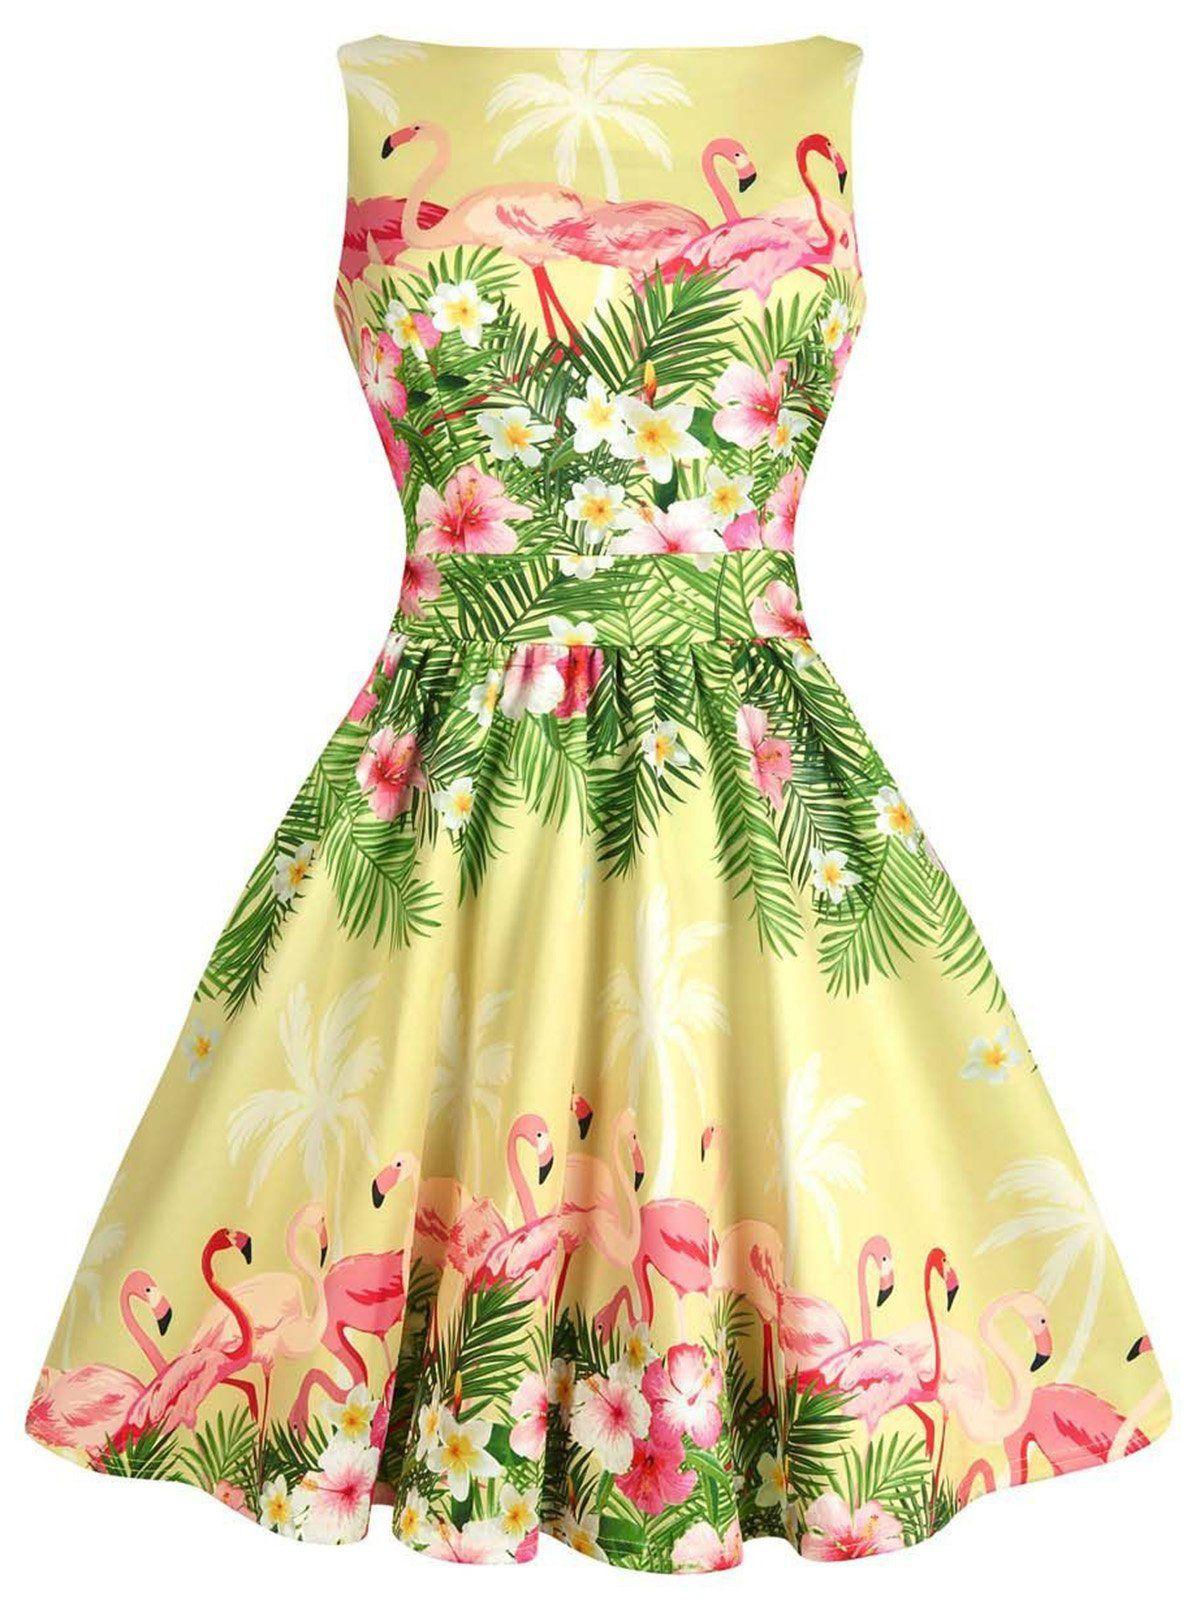 1950s Flamingo Floral Swing Dress Retro Stage Chic Vintage Dresses And Accessories Yellow Tea Dresses Tea Dress Rockabilly Dress [ 1600 x 1200 Pixel ]